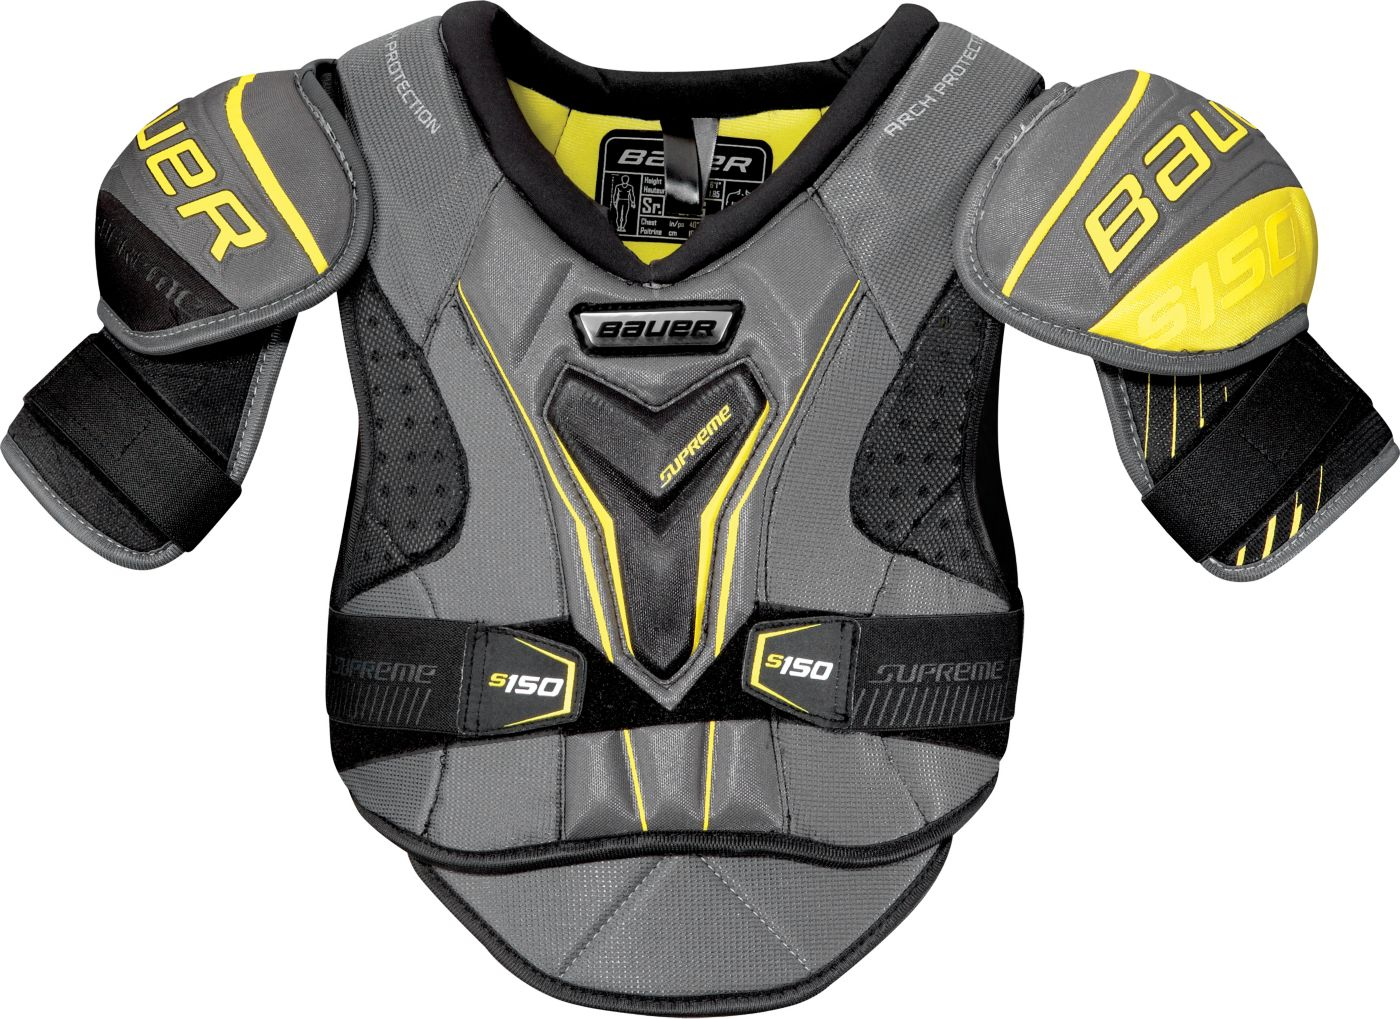 Bauer Senior Supreme S150 Ice Hockey Shoulder Pads